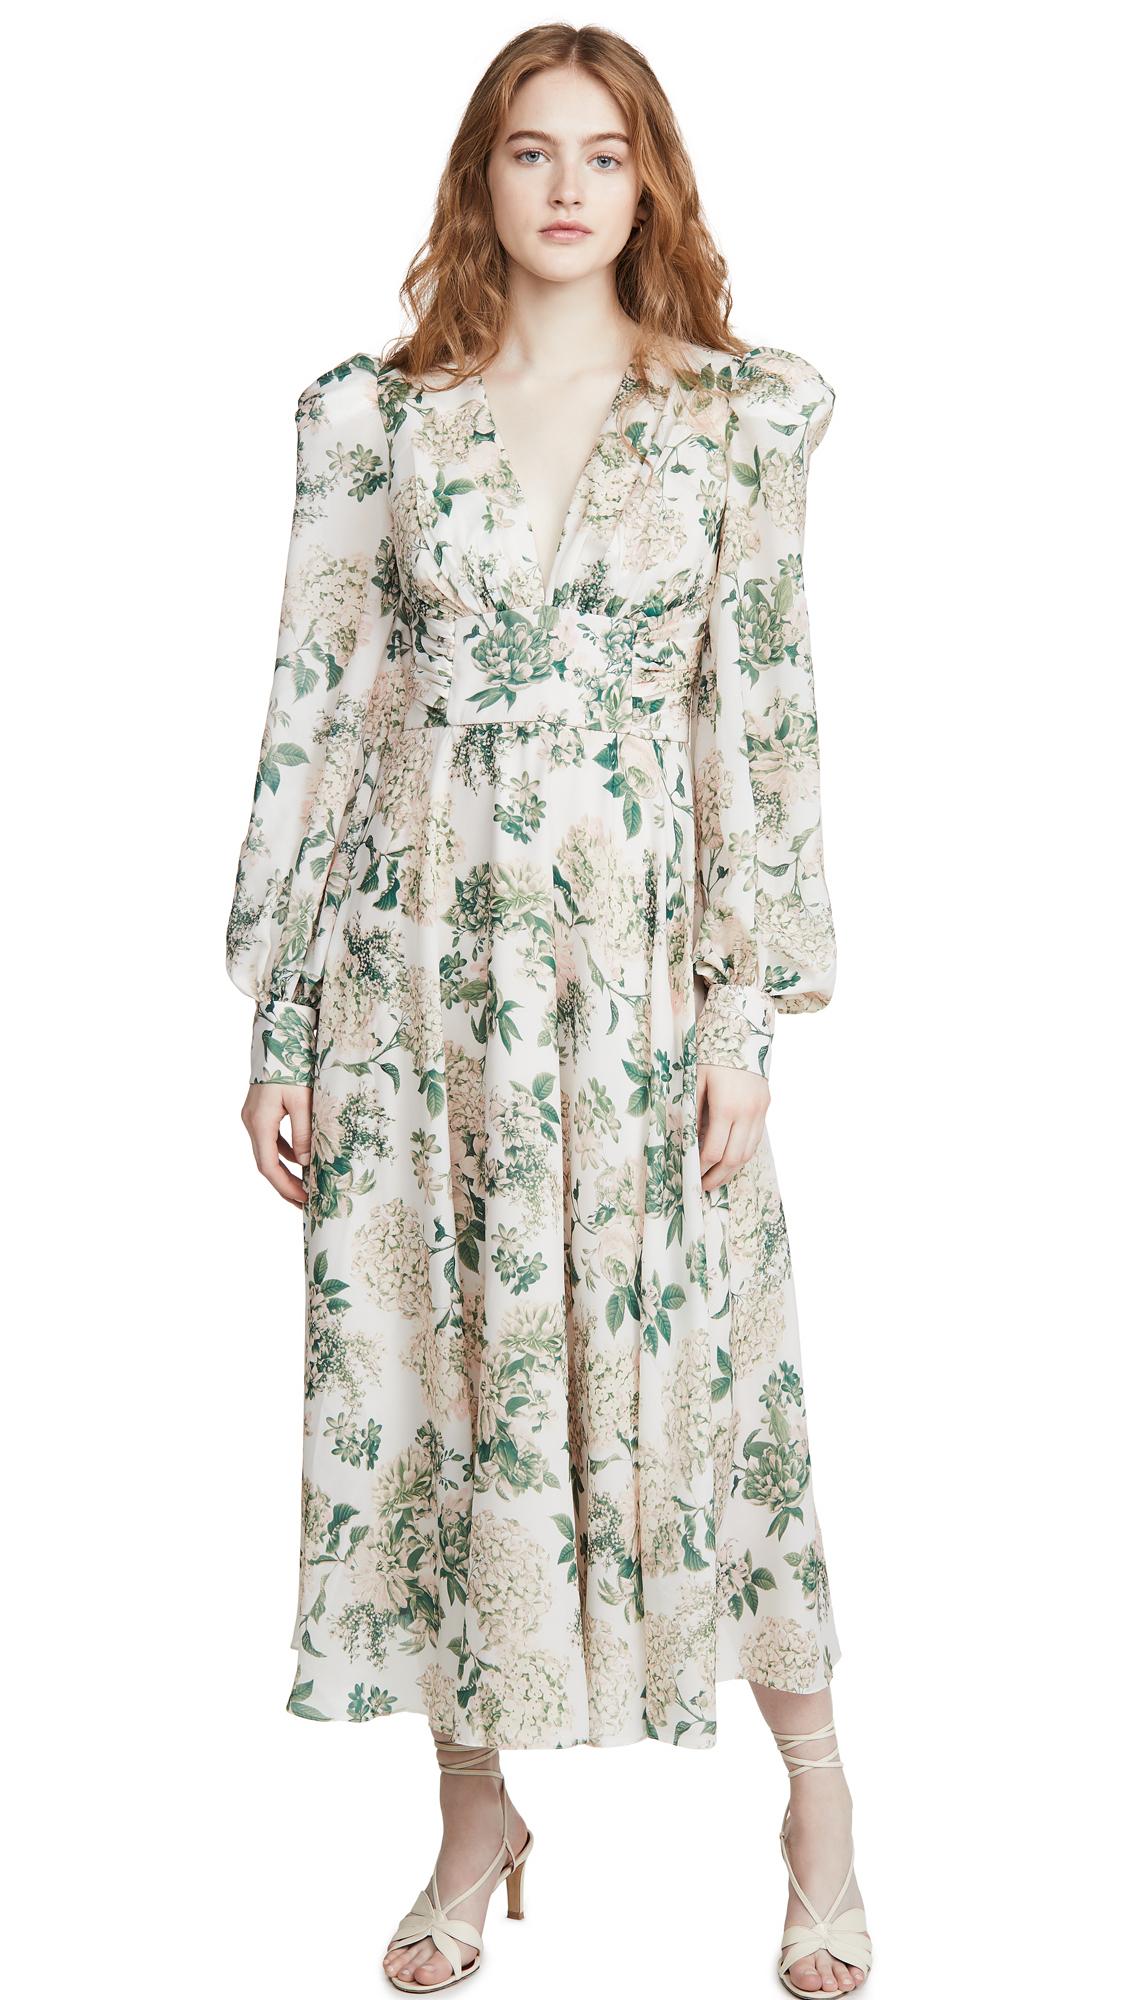 IORANE Vintage Garden Midi Dress - 40% Off Sale